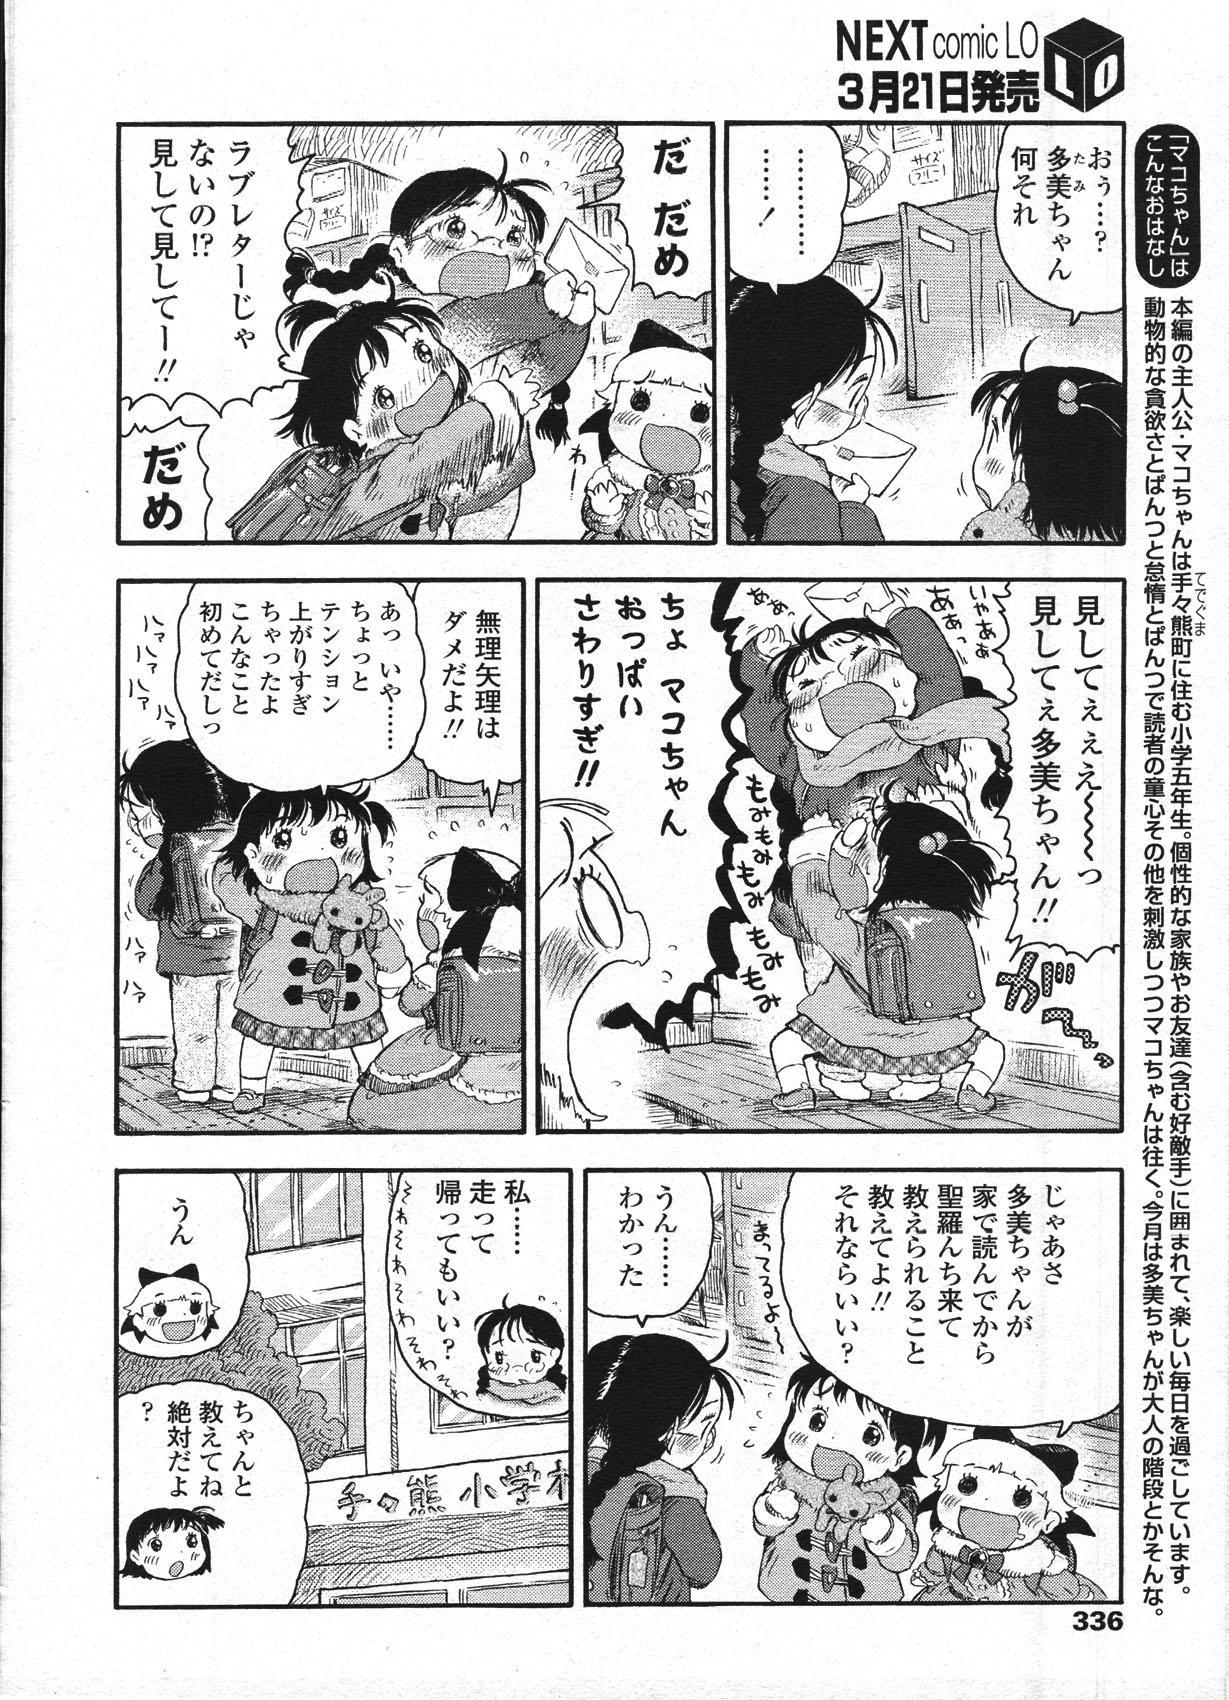 Comic LO 2009-04 Vol. 61 338